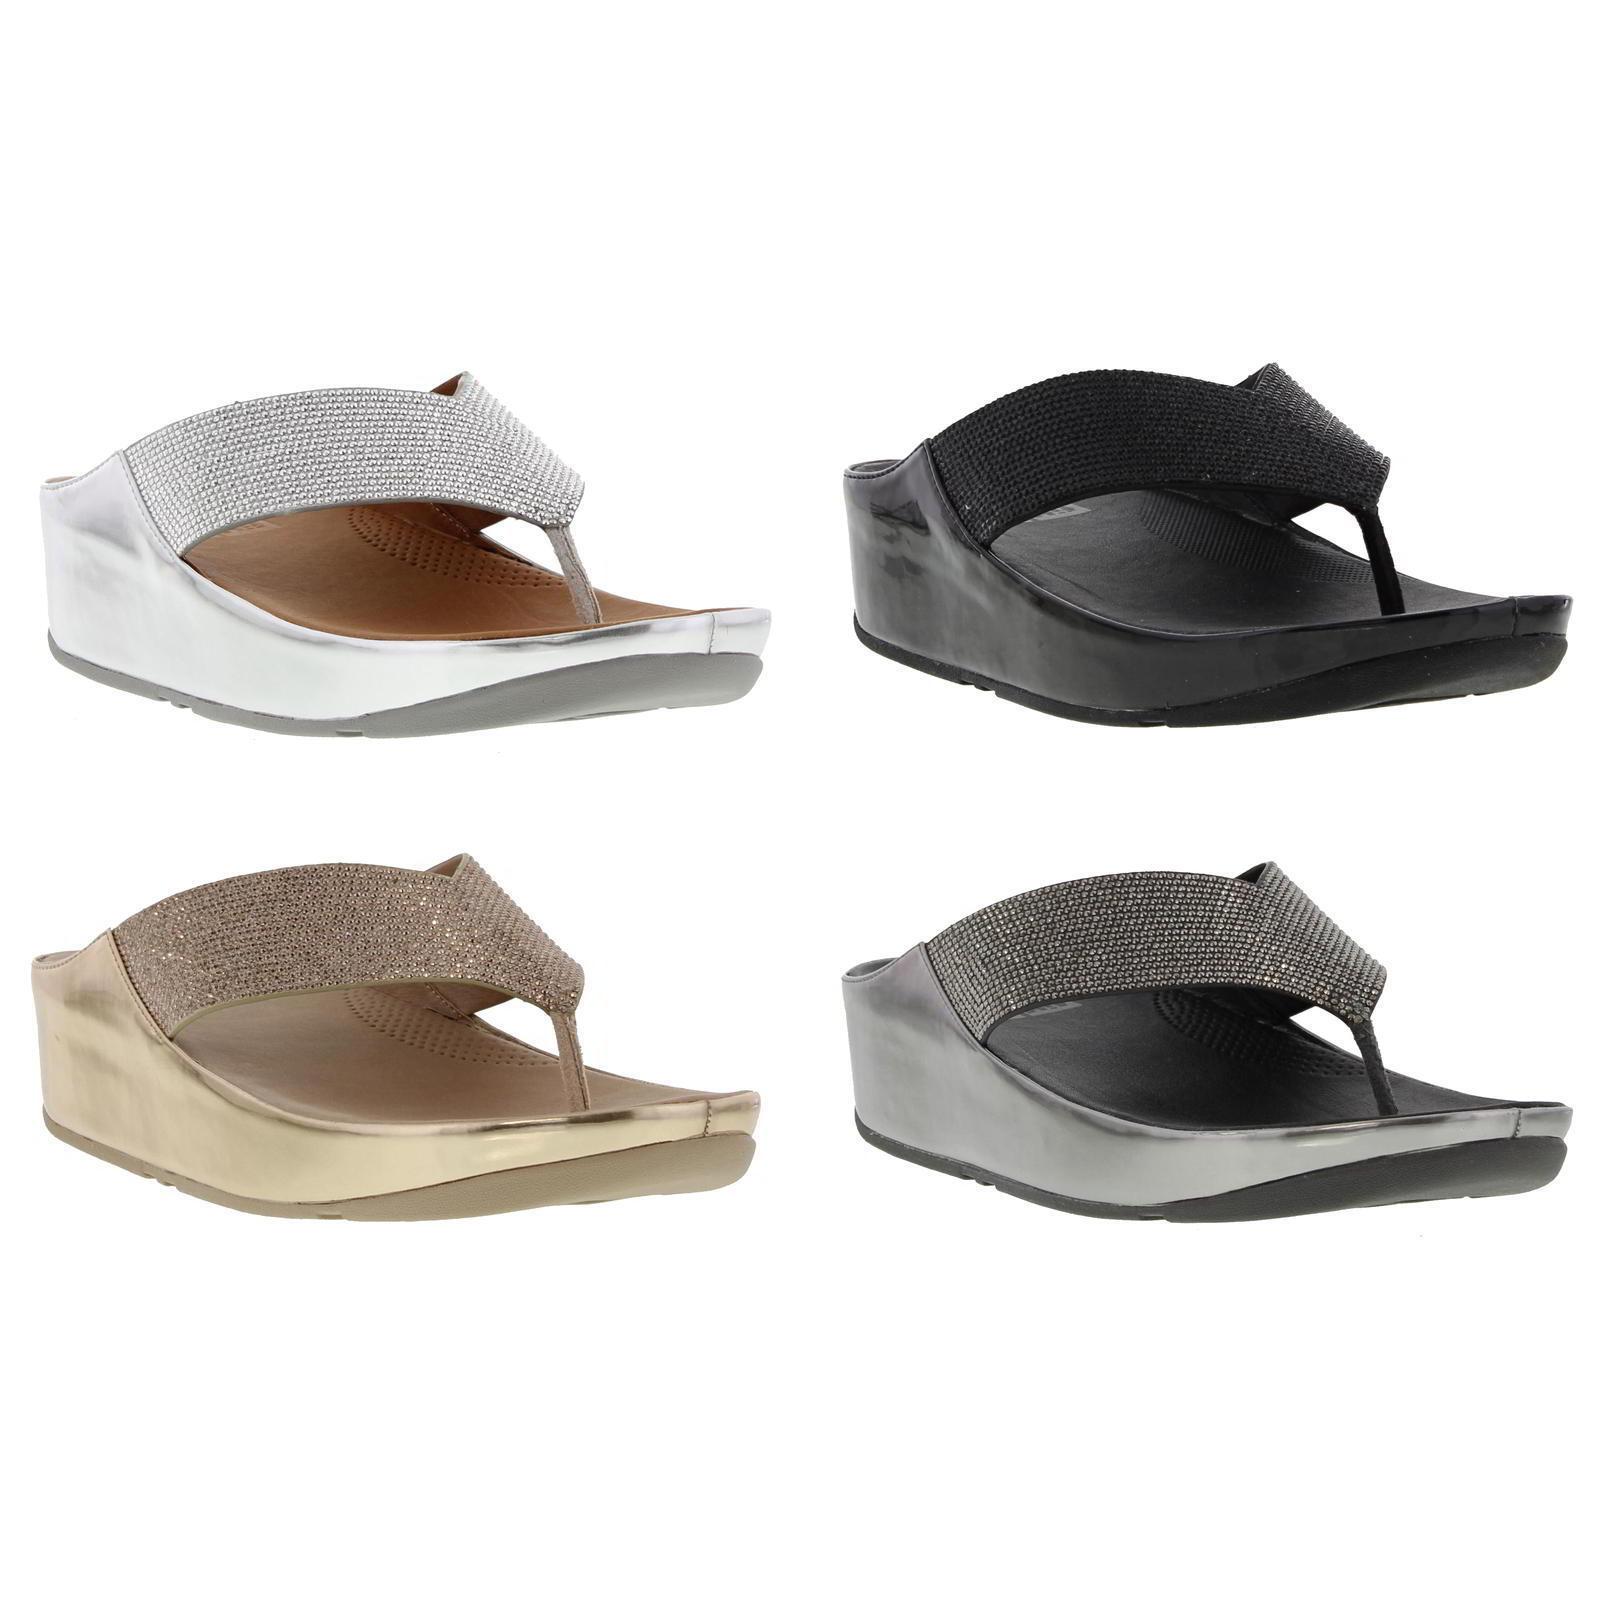 FitFlop Crystall Damenschuhe Toe Post Sandales Größe 4-8